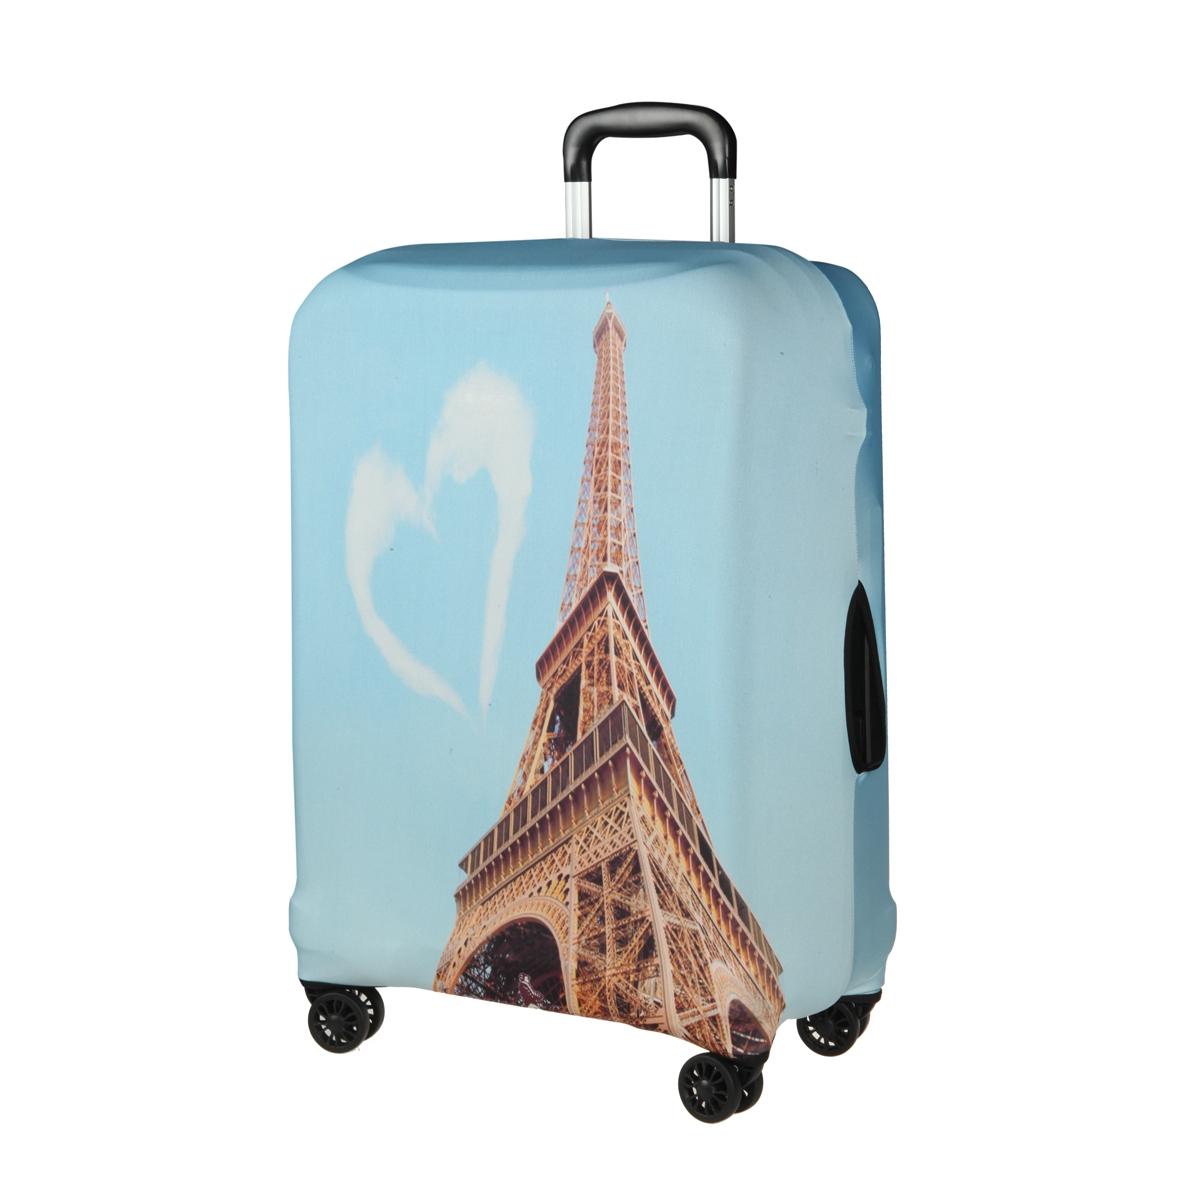 Защитное покрытие для чемодана Gianni Conti 9045 M.